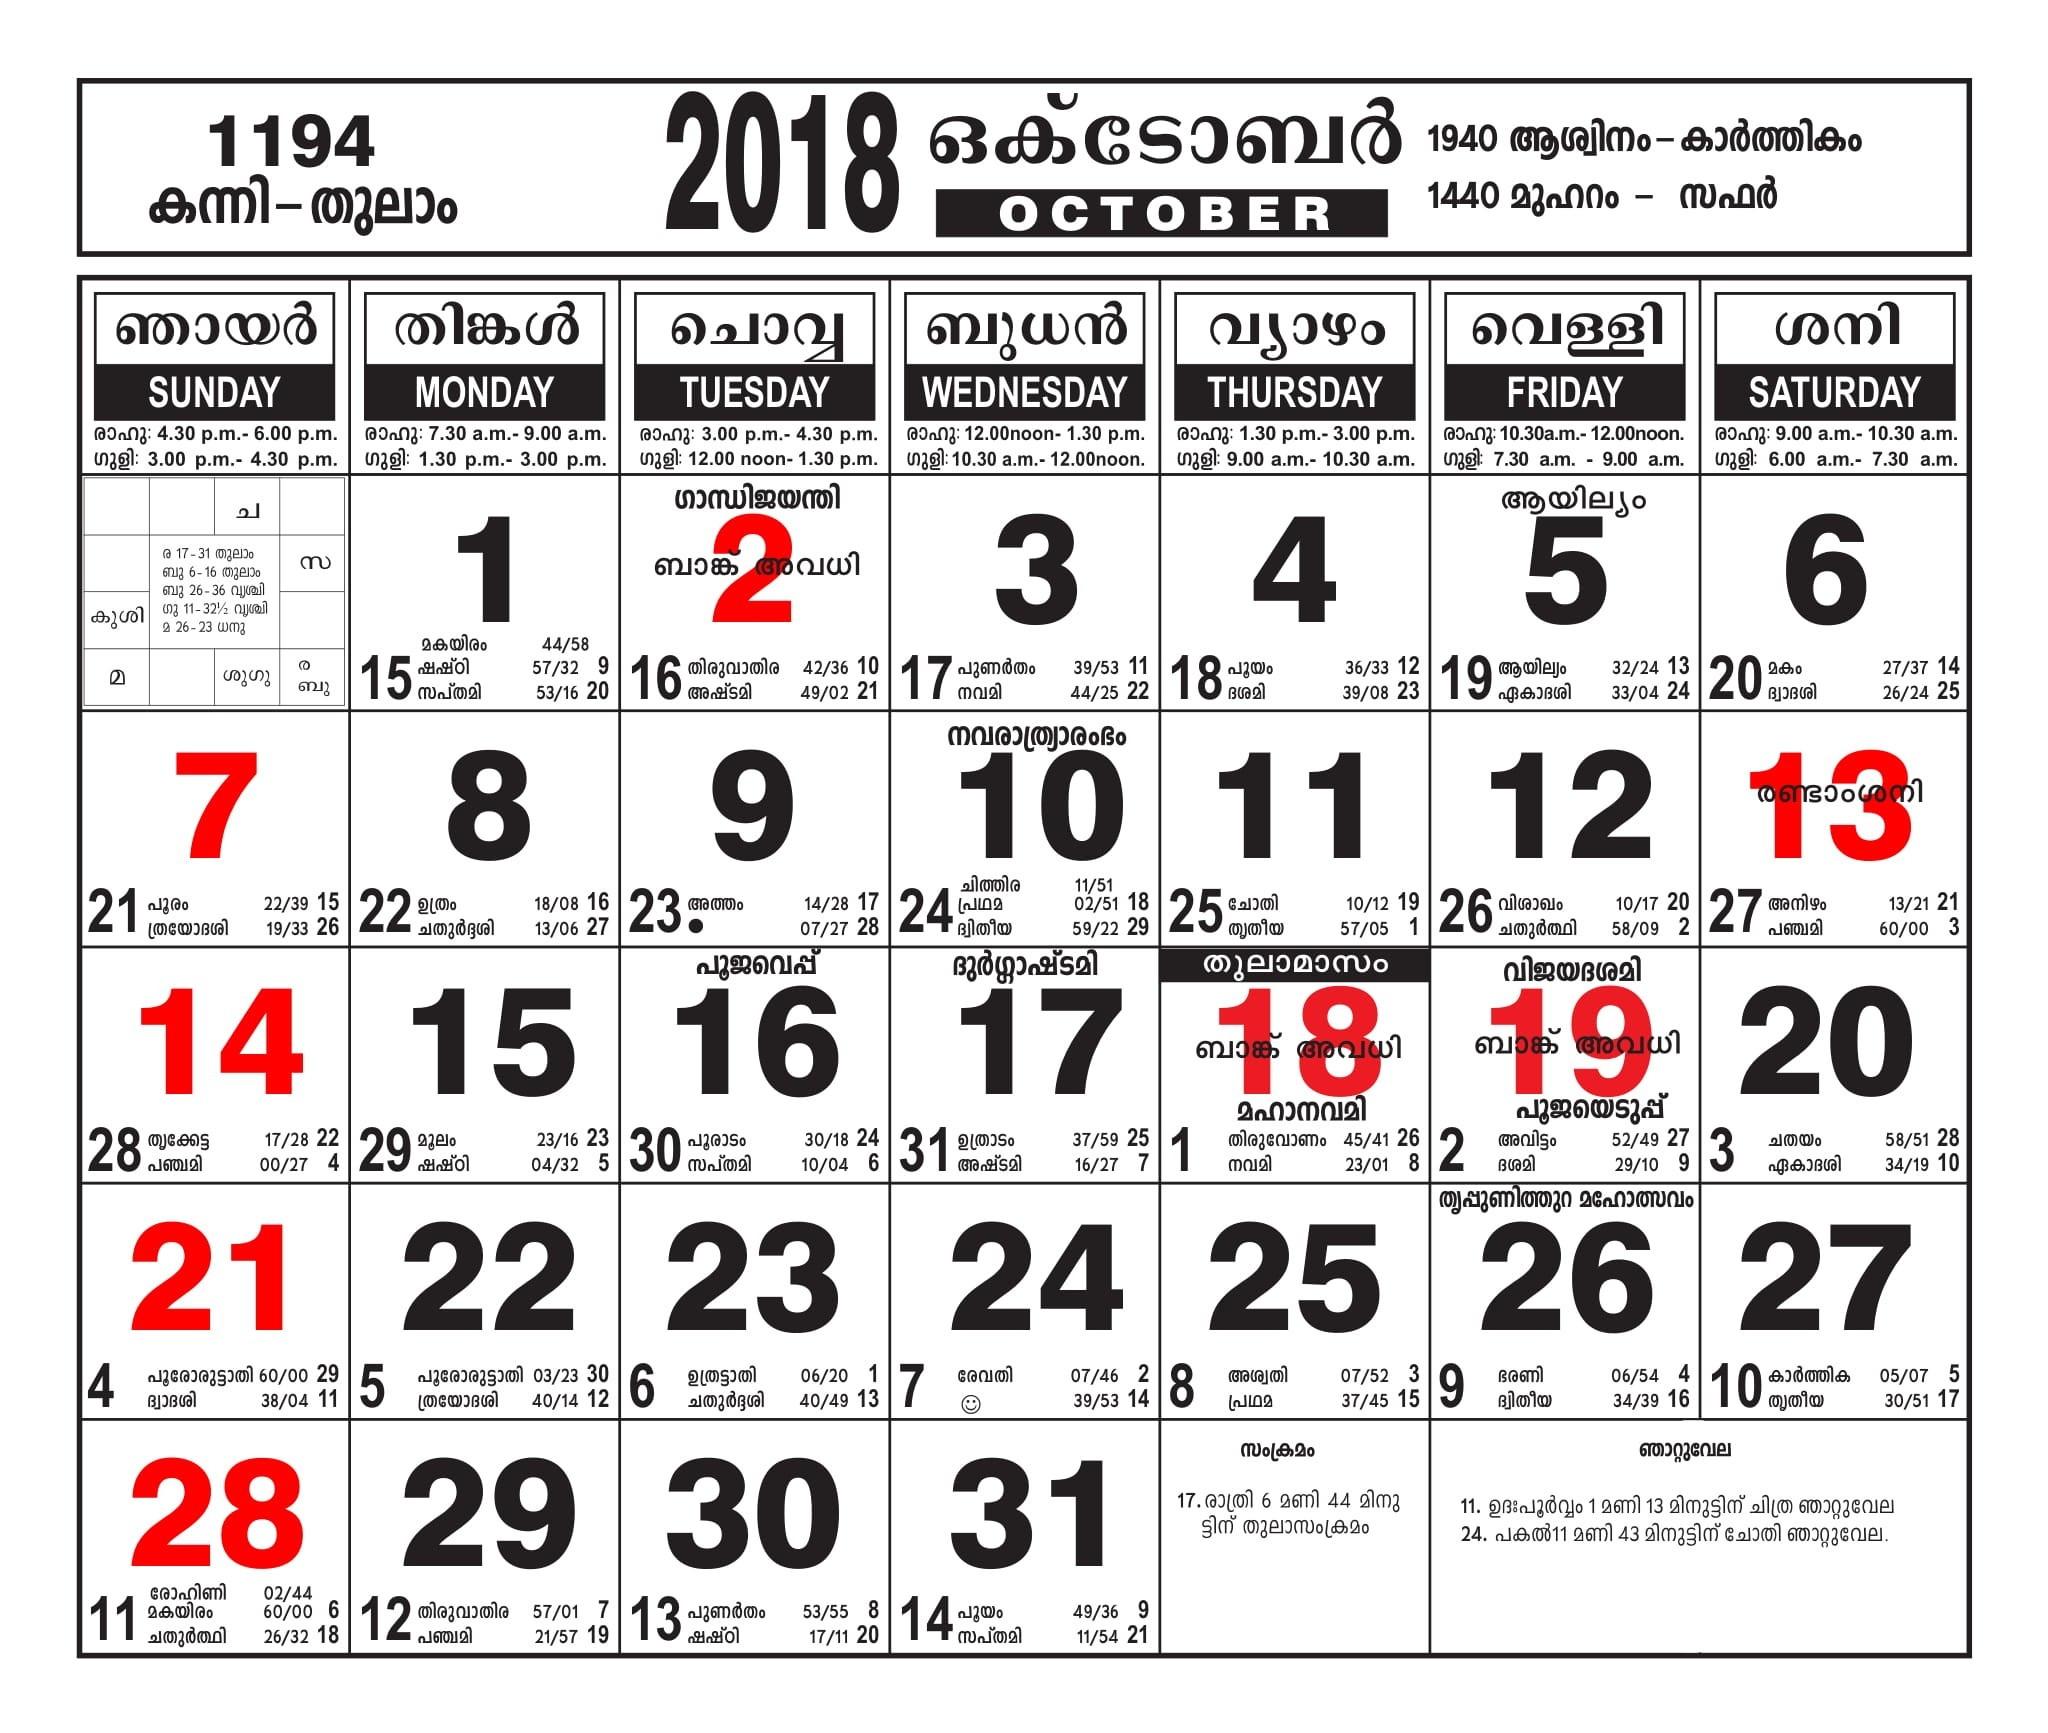 Kerala Government Calendar 2020 Pdf - Template Calendar Design  2021 Calendar Govt. Of Kerala